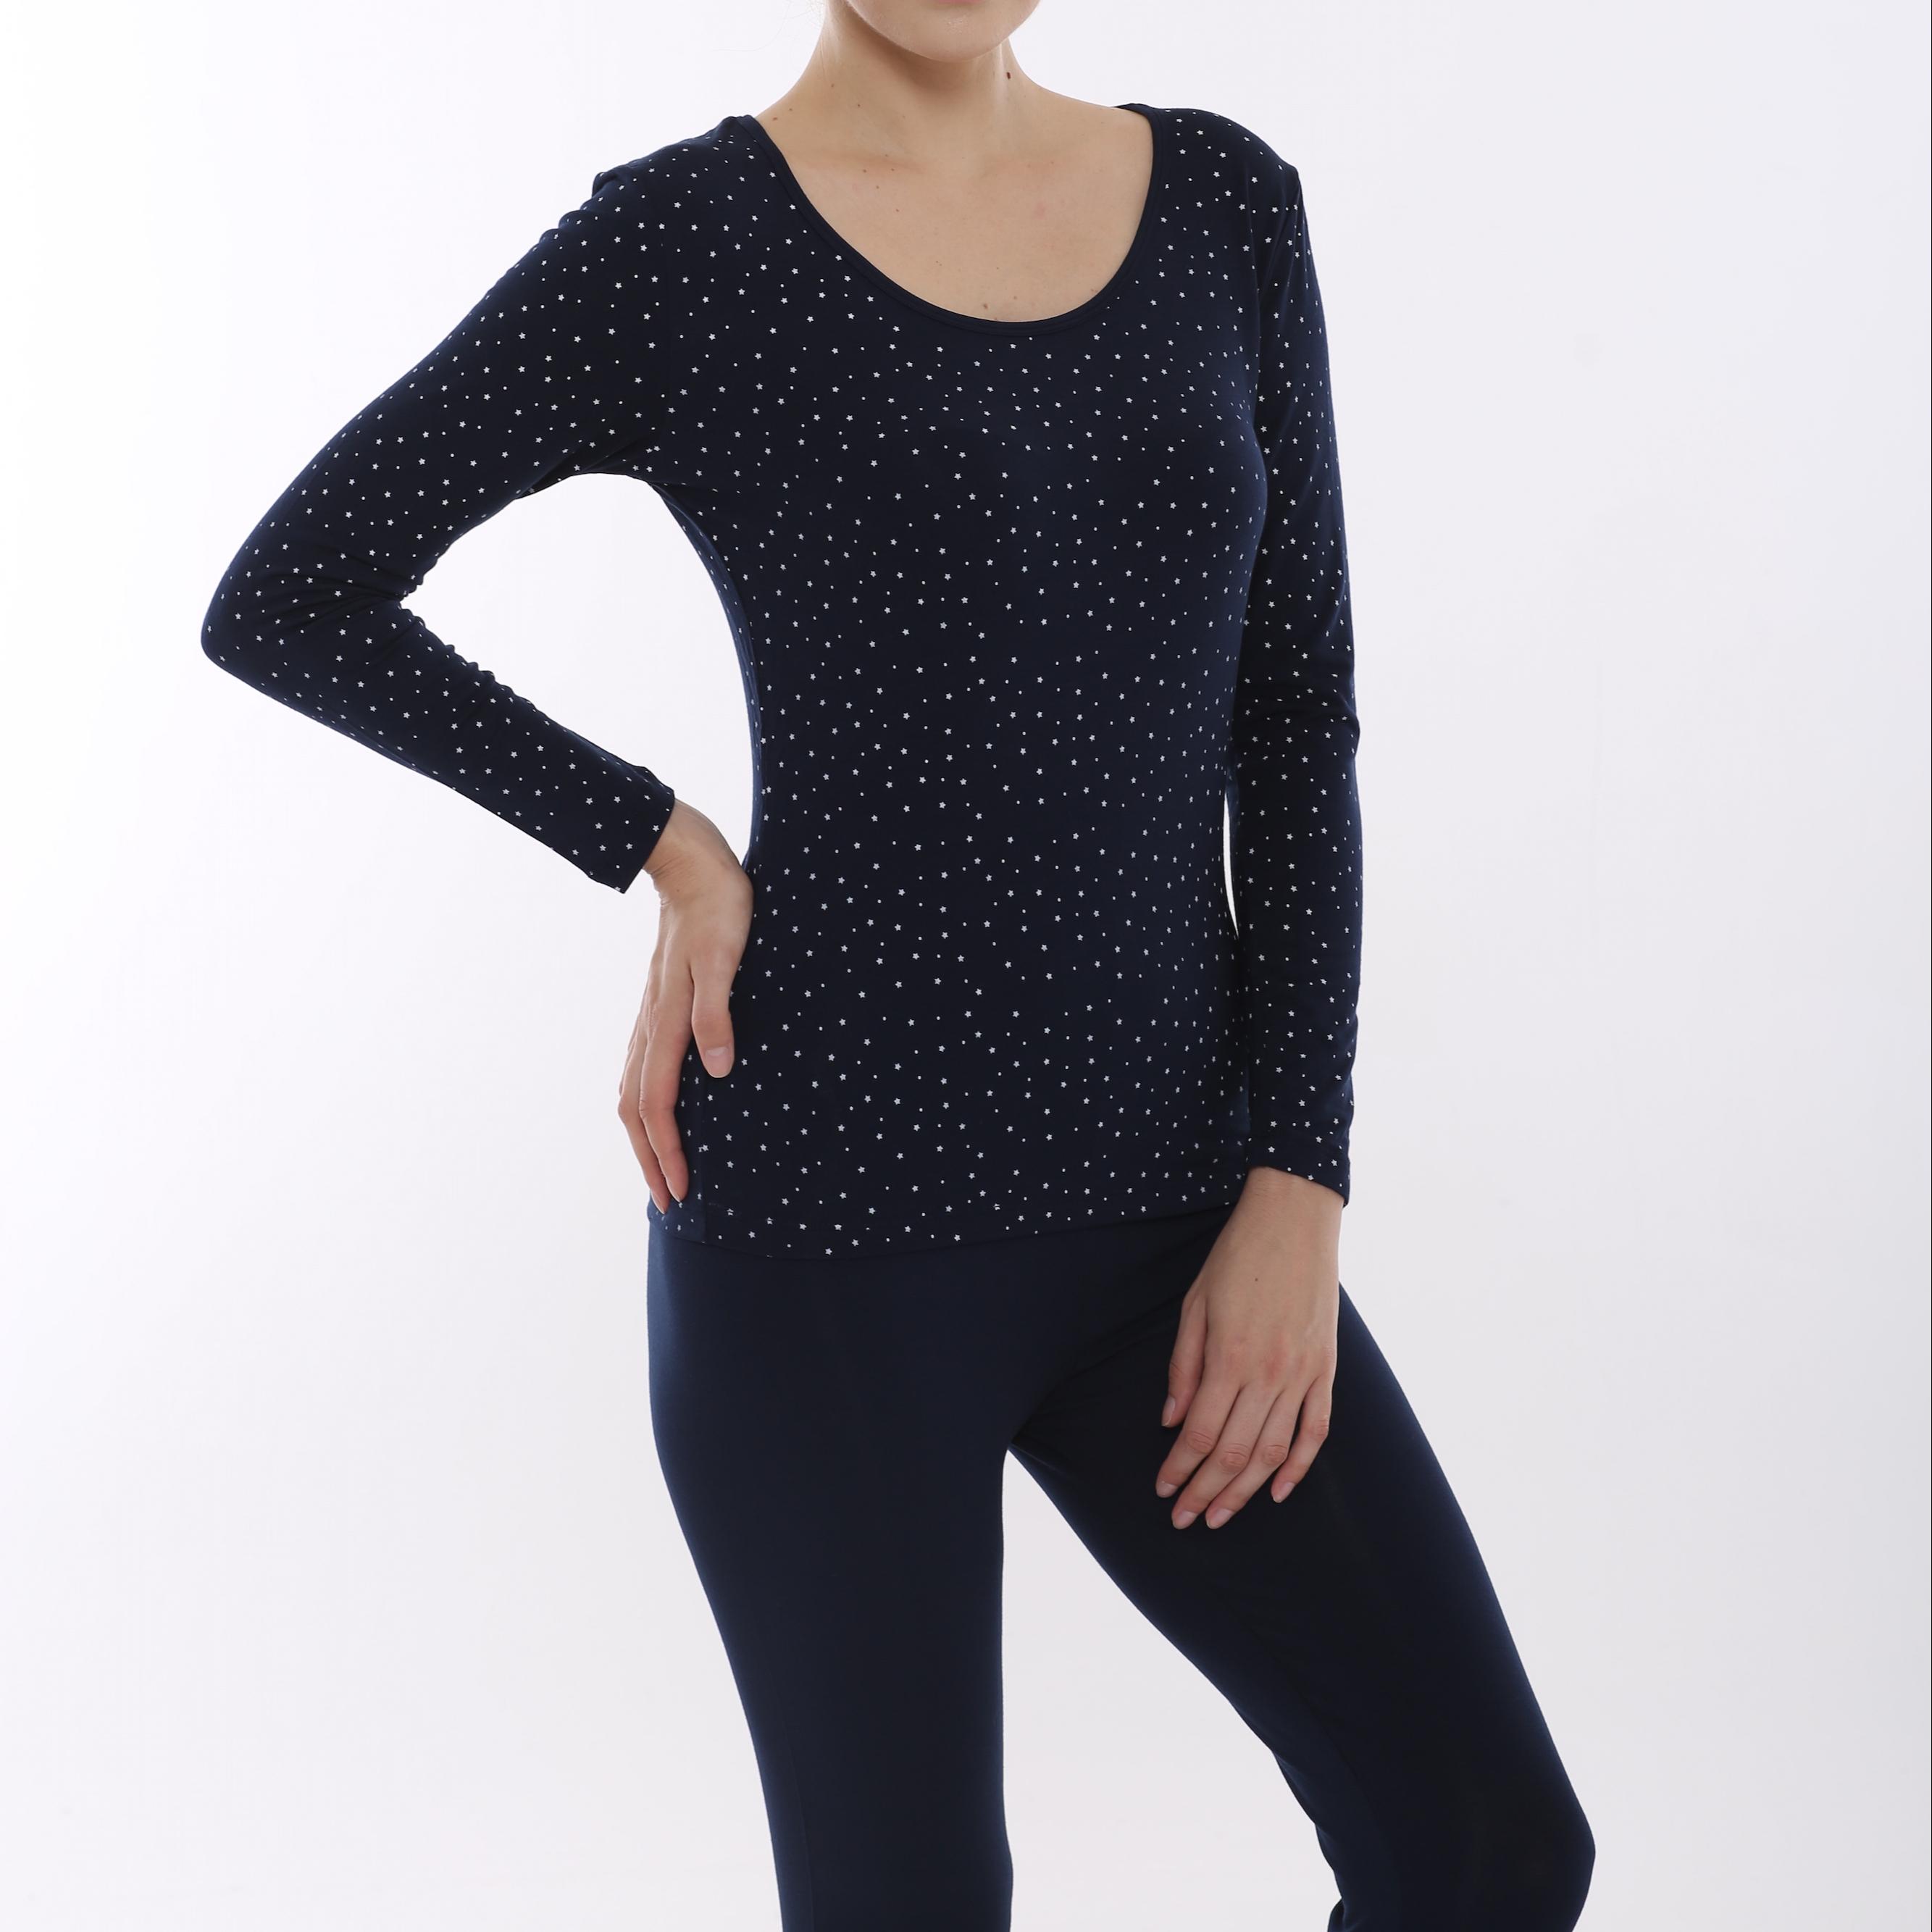 Modal Thermal Printing Dots Long Sleeve Shirts Underwear Set Lingerie Set Women Navy